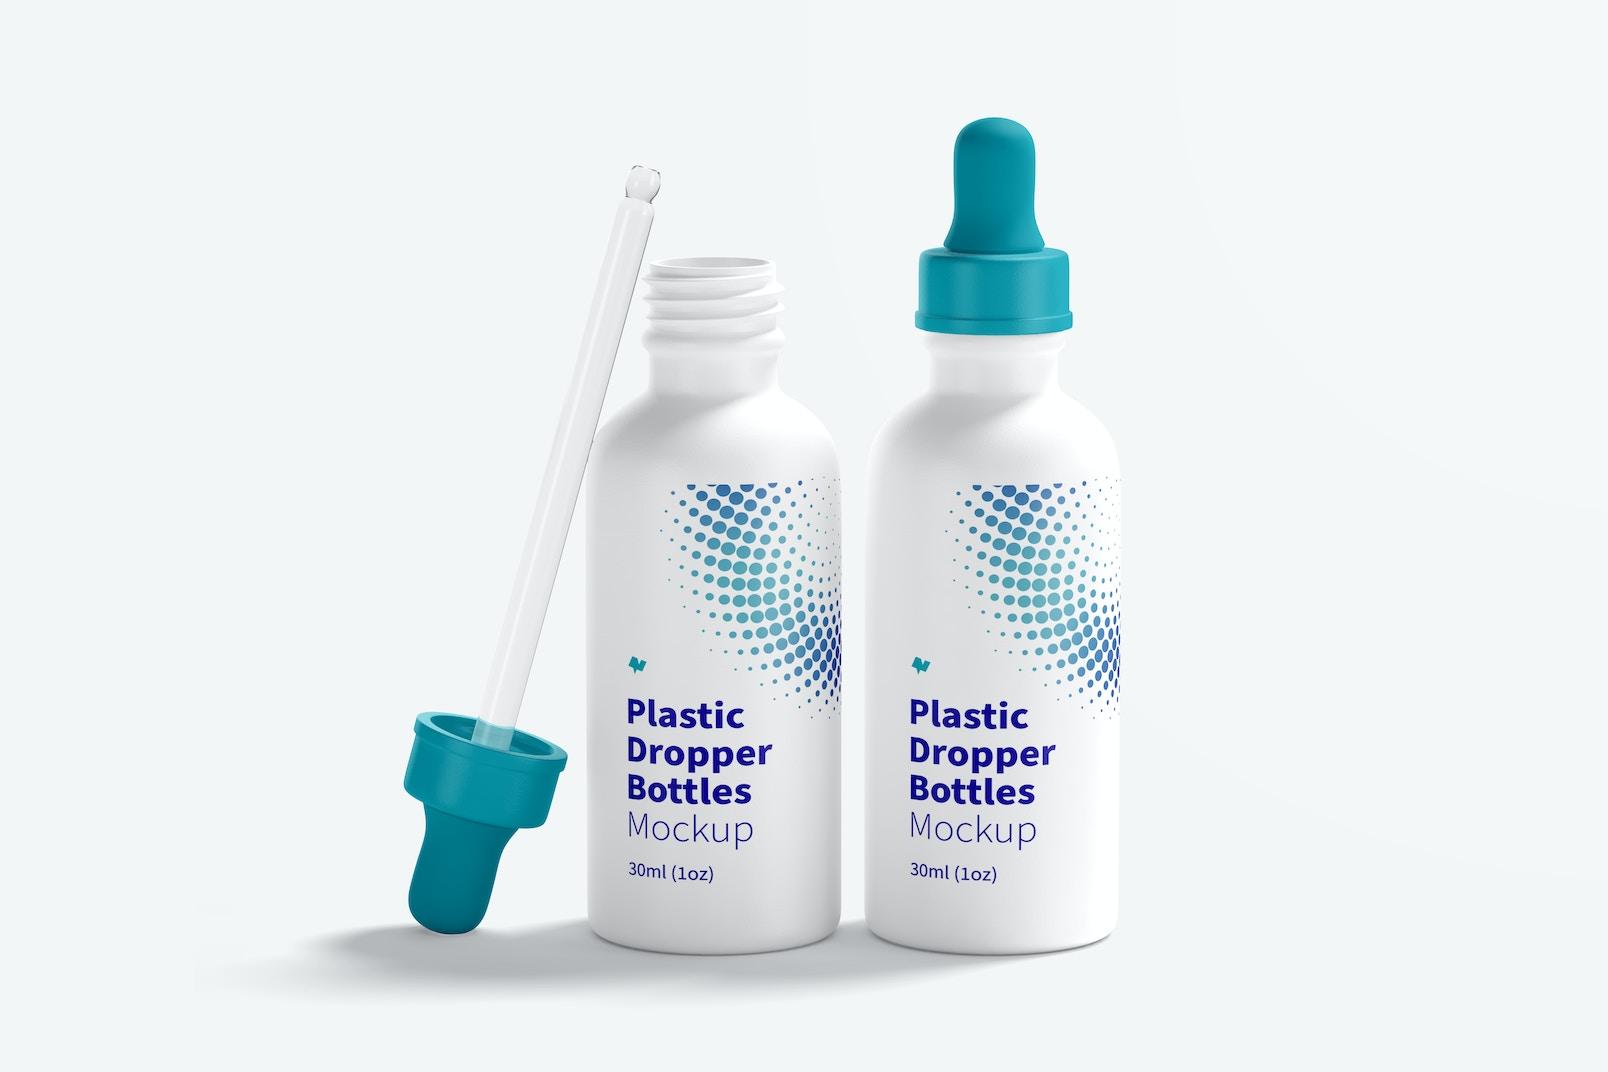 Two Plastic Dropper Bottles Mockup